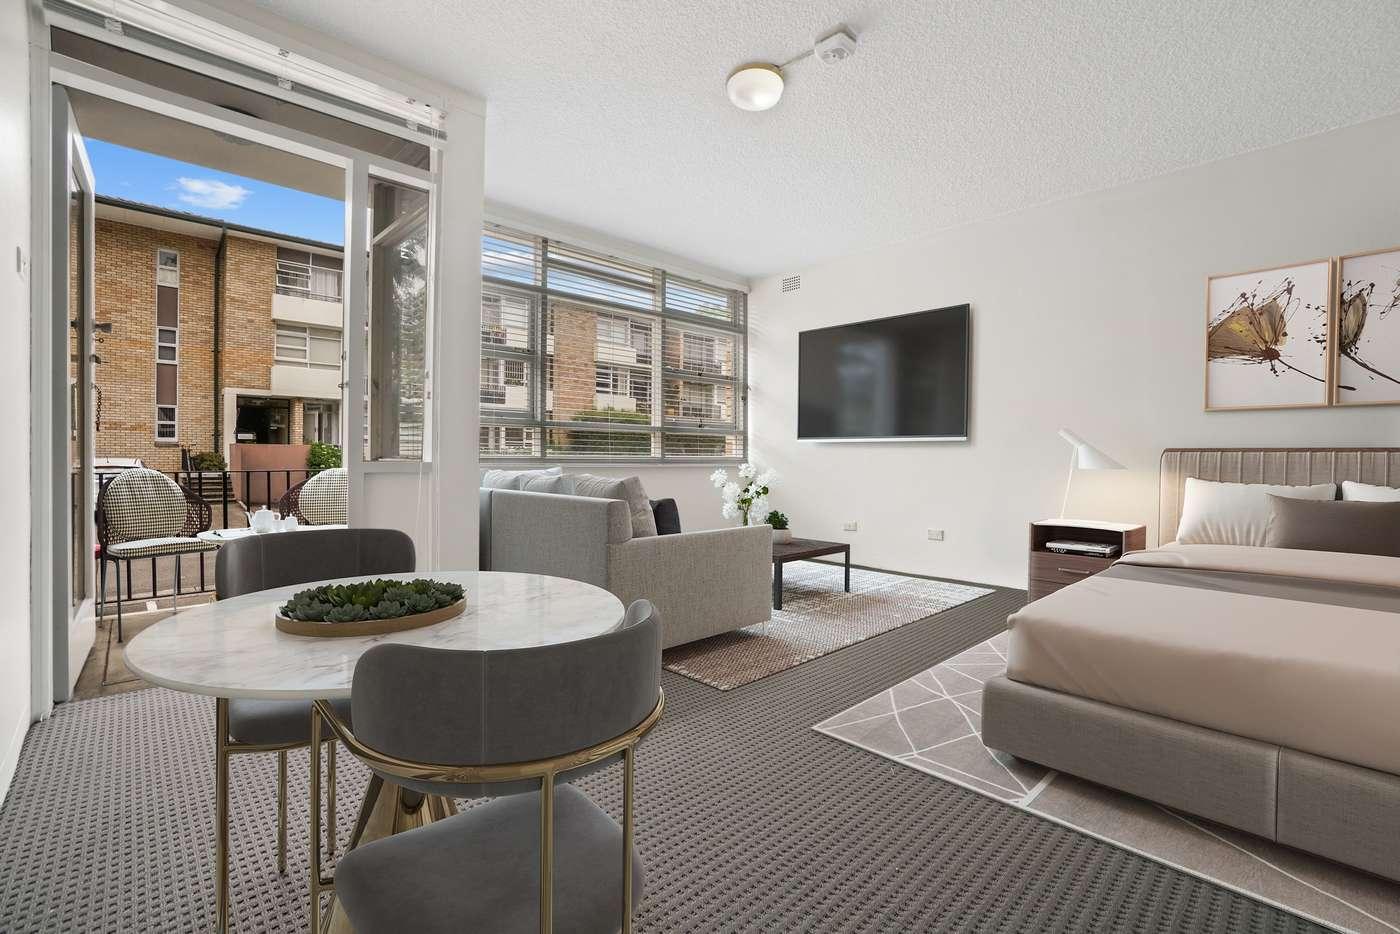 Main view of Homely studio listing, 23/8 Brunswick, Ashfield NSW 2131